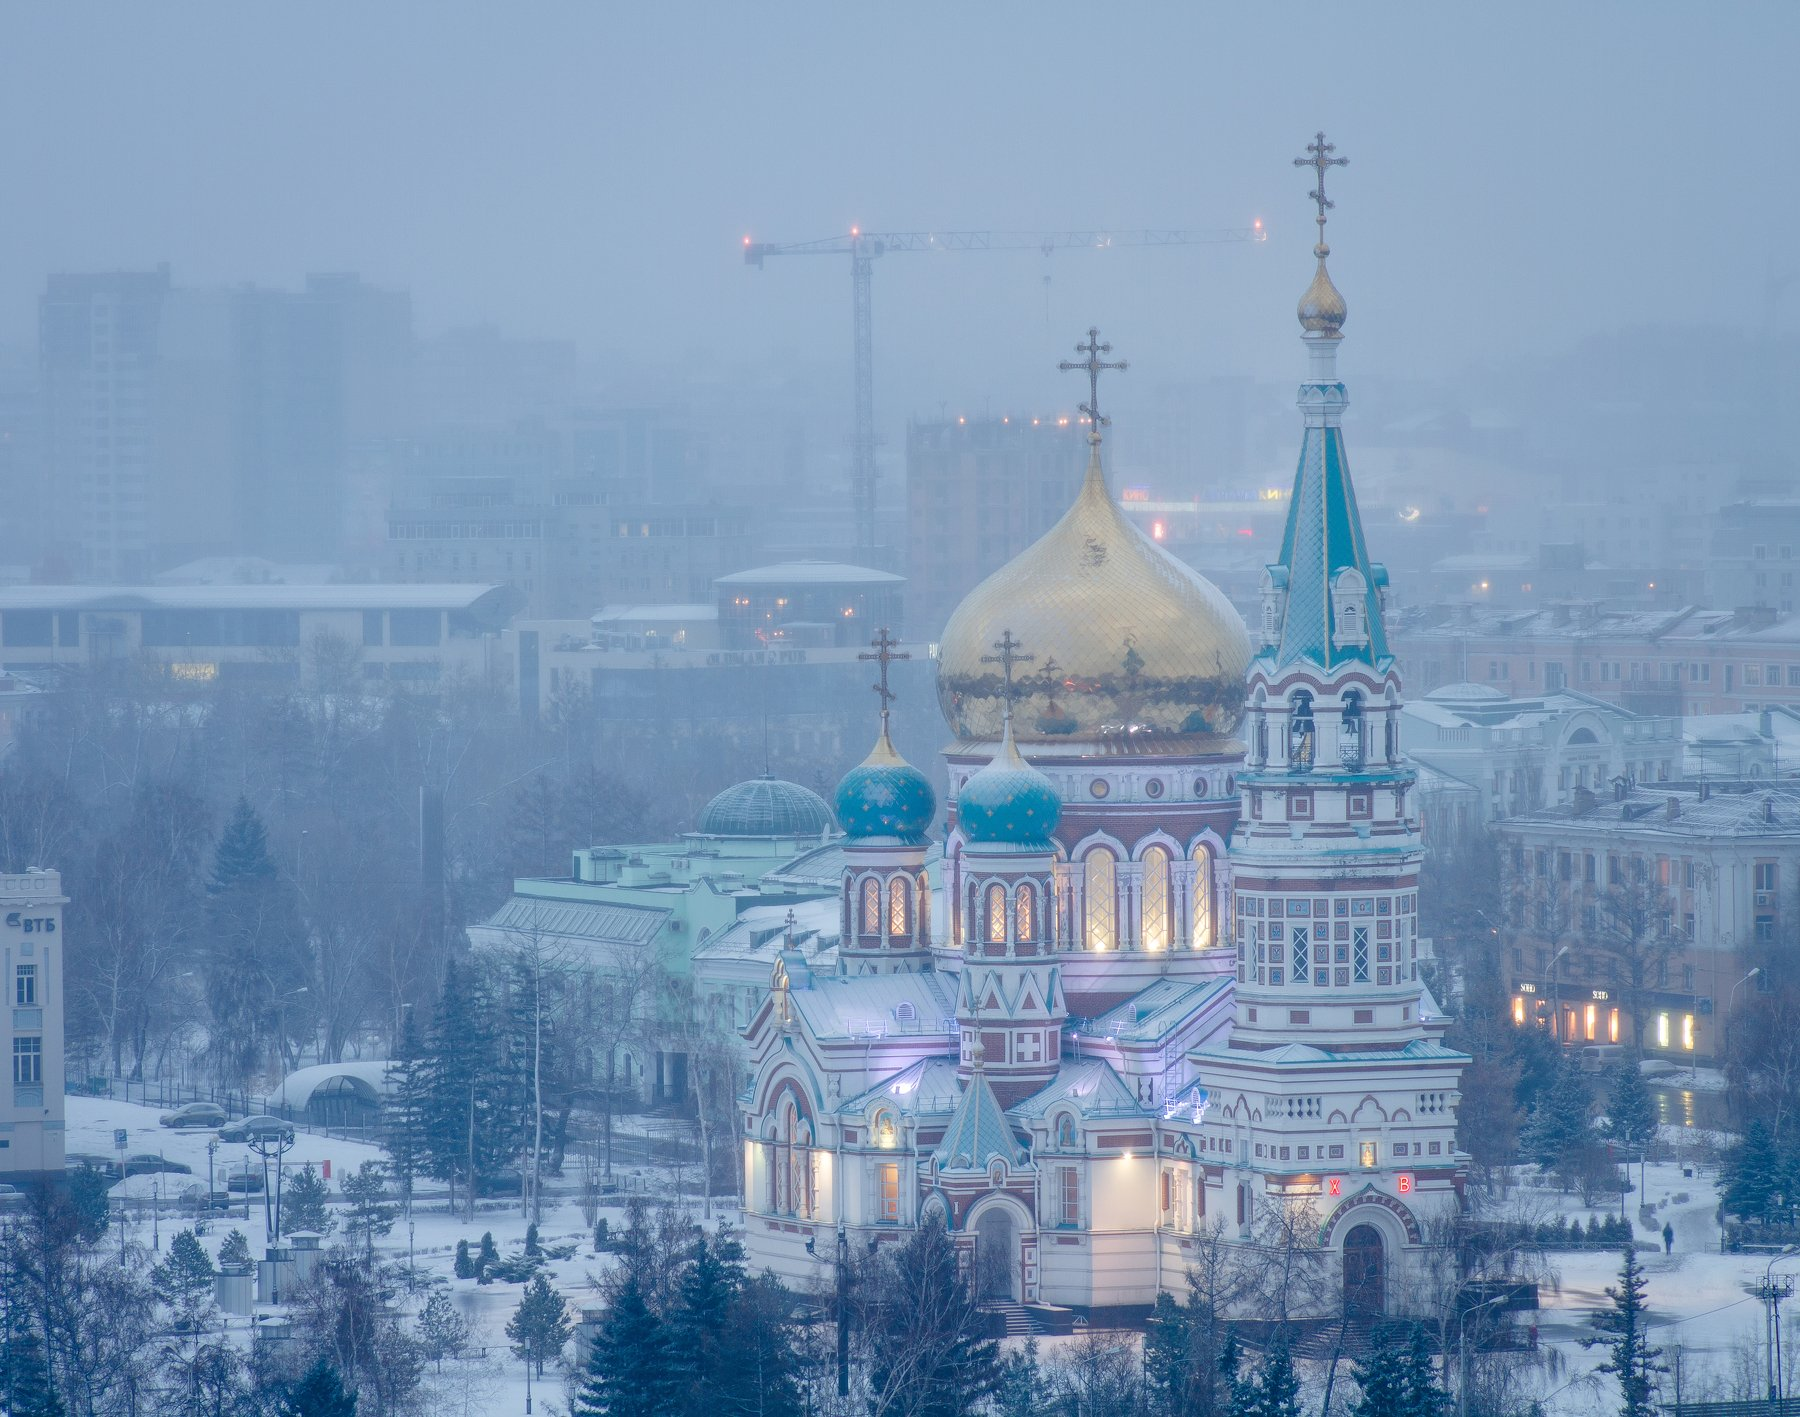 Омск, пейзаж, зима, снег, храм, церковь, Голубев Алексей